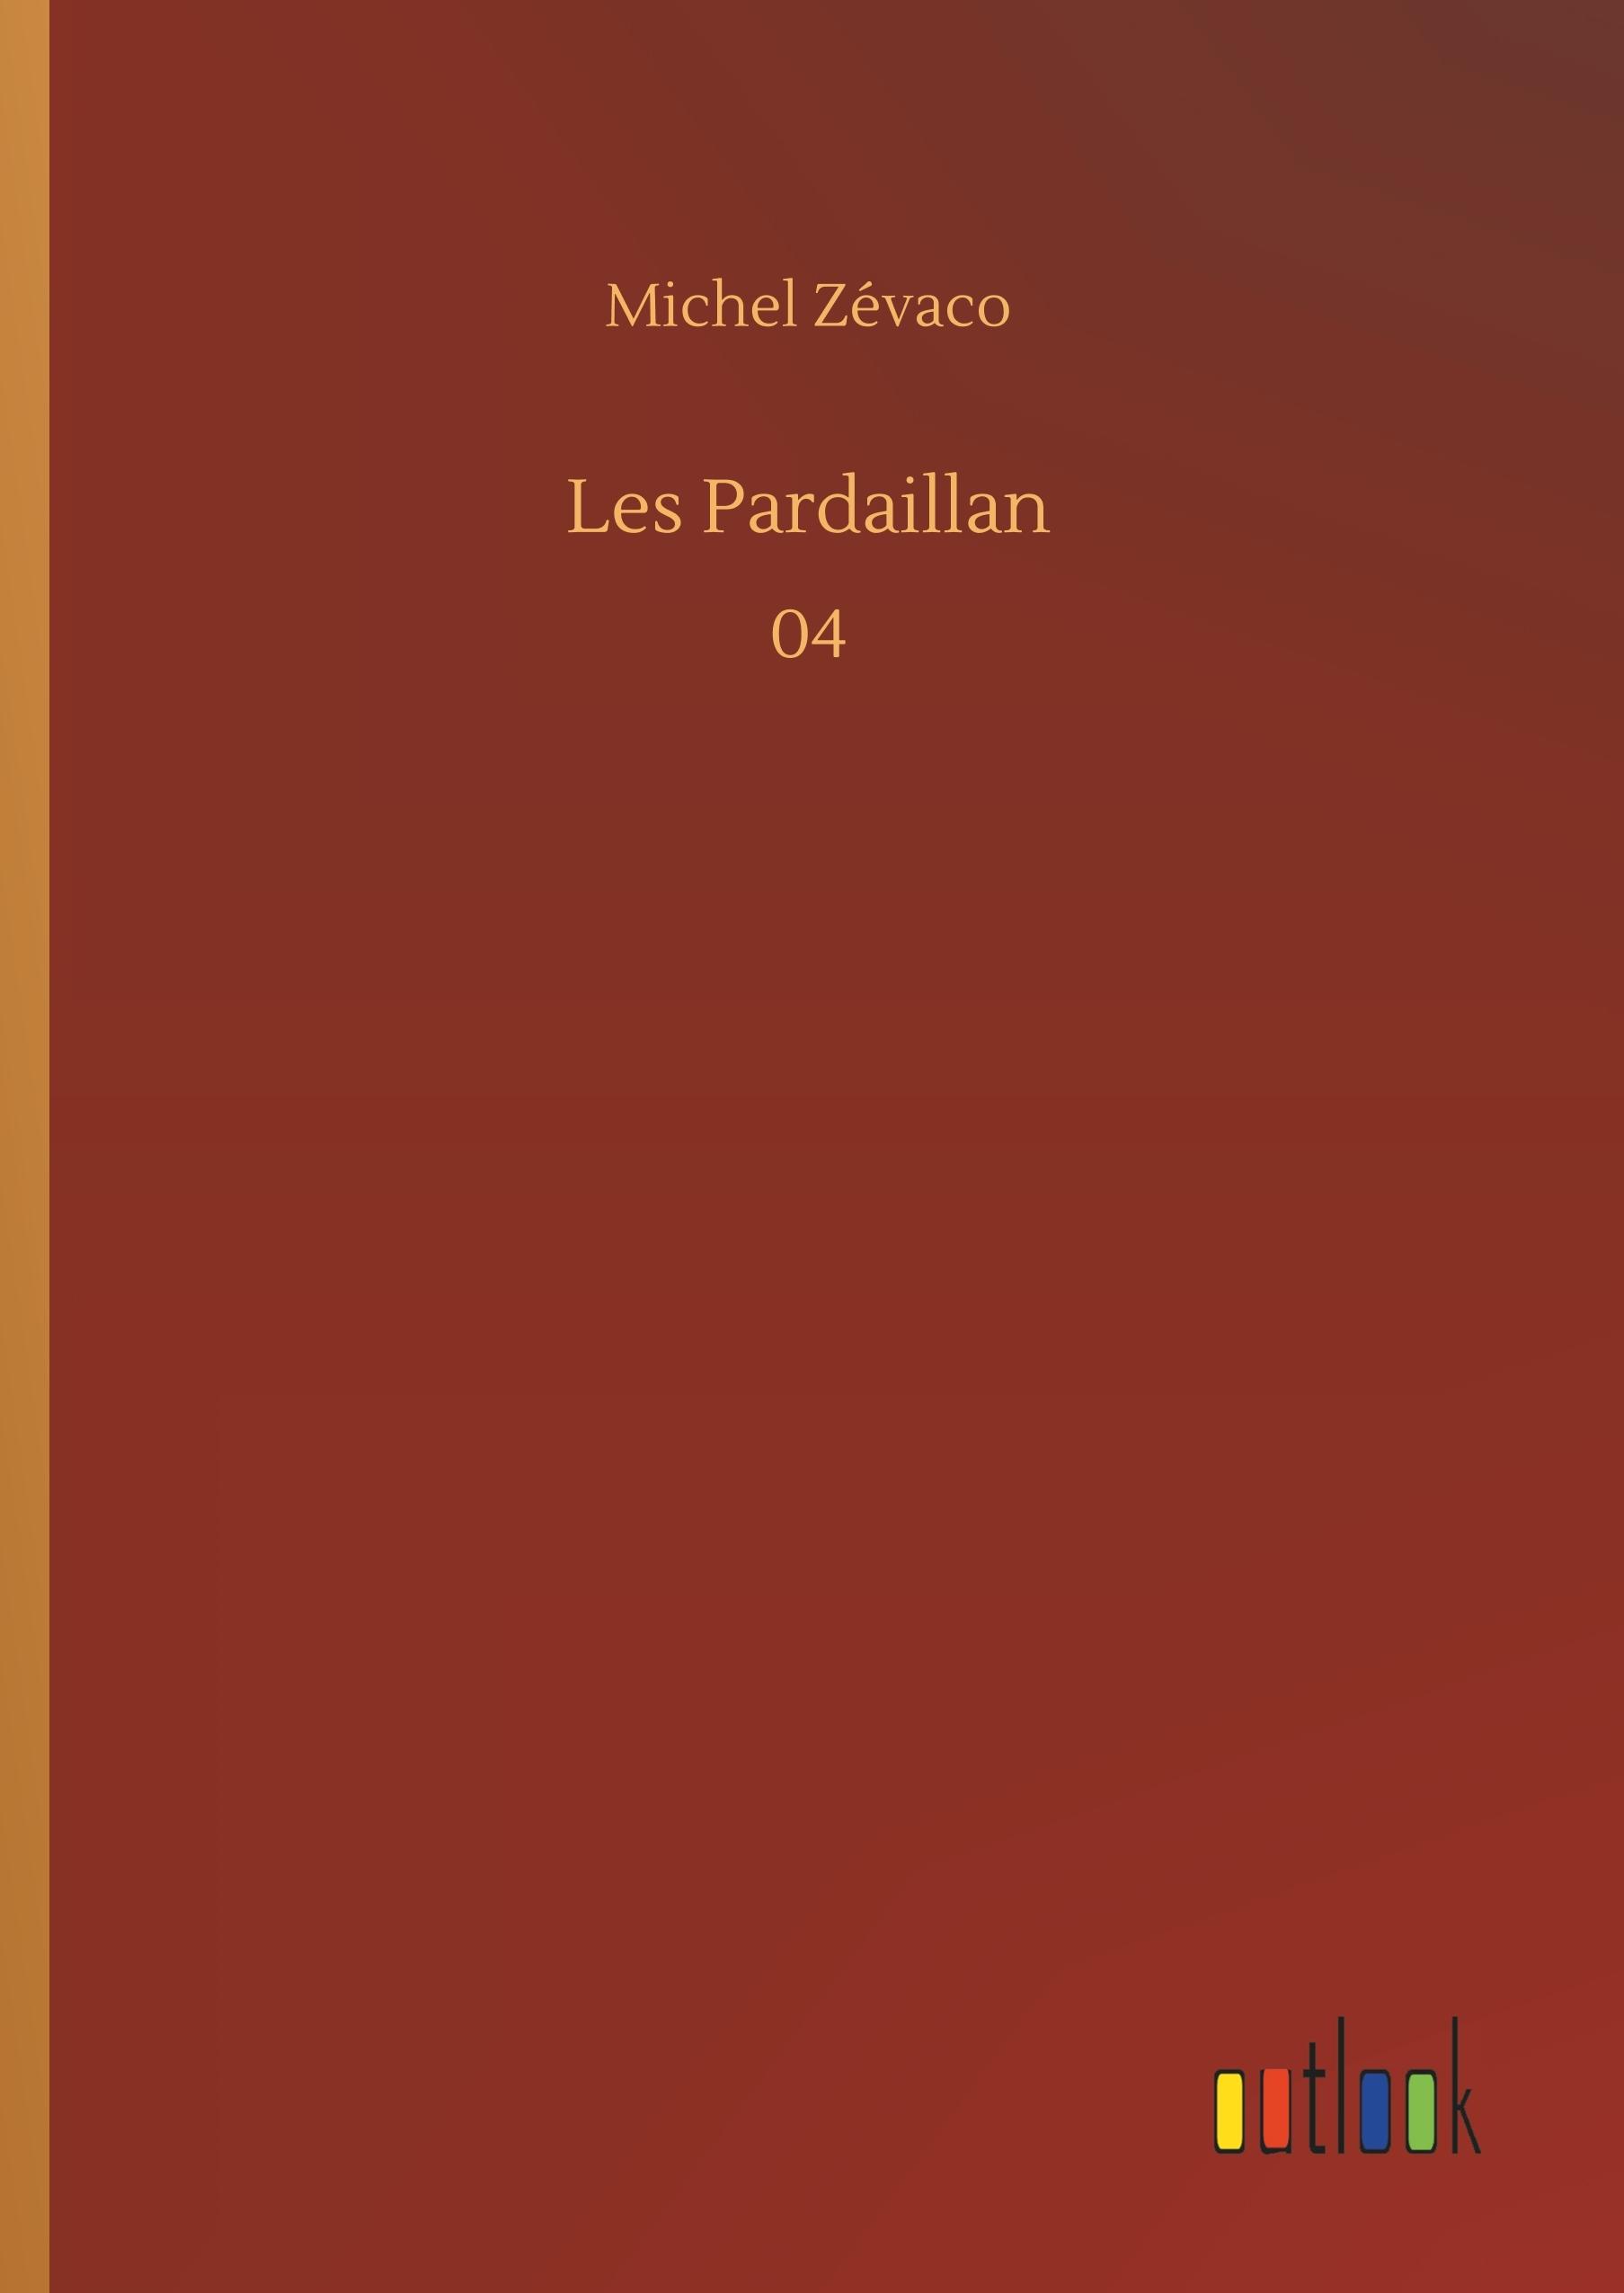 LES PARDAILLAN - 04